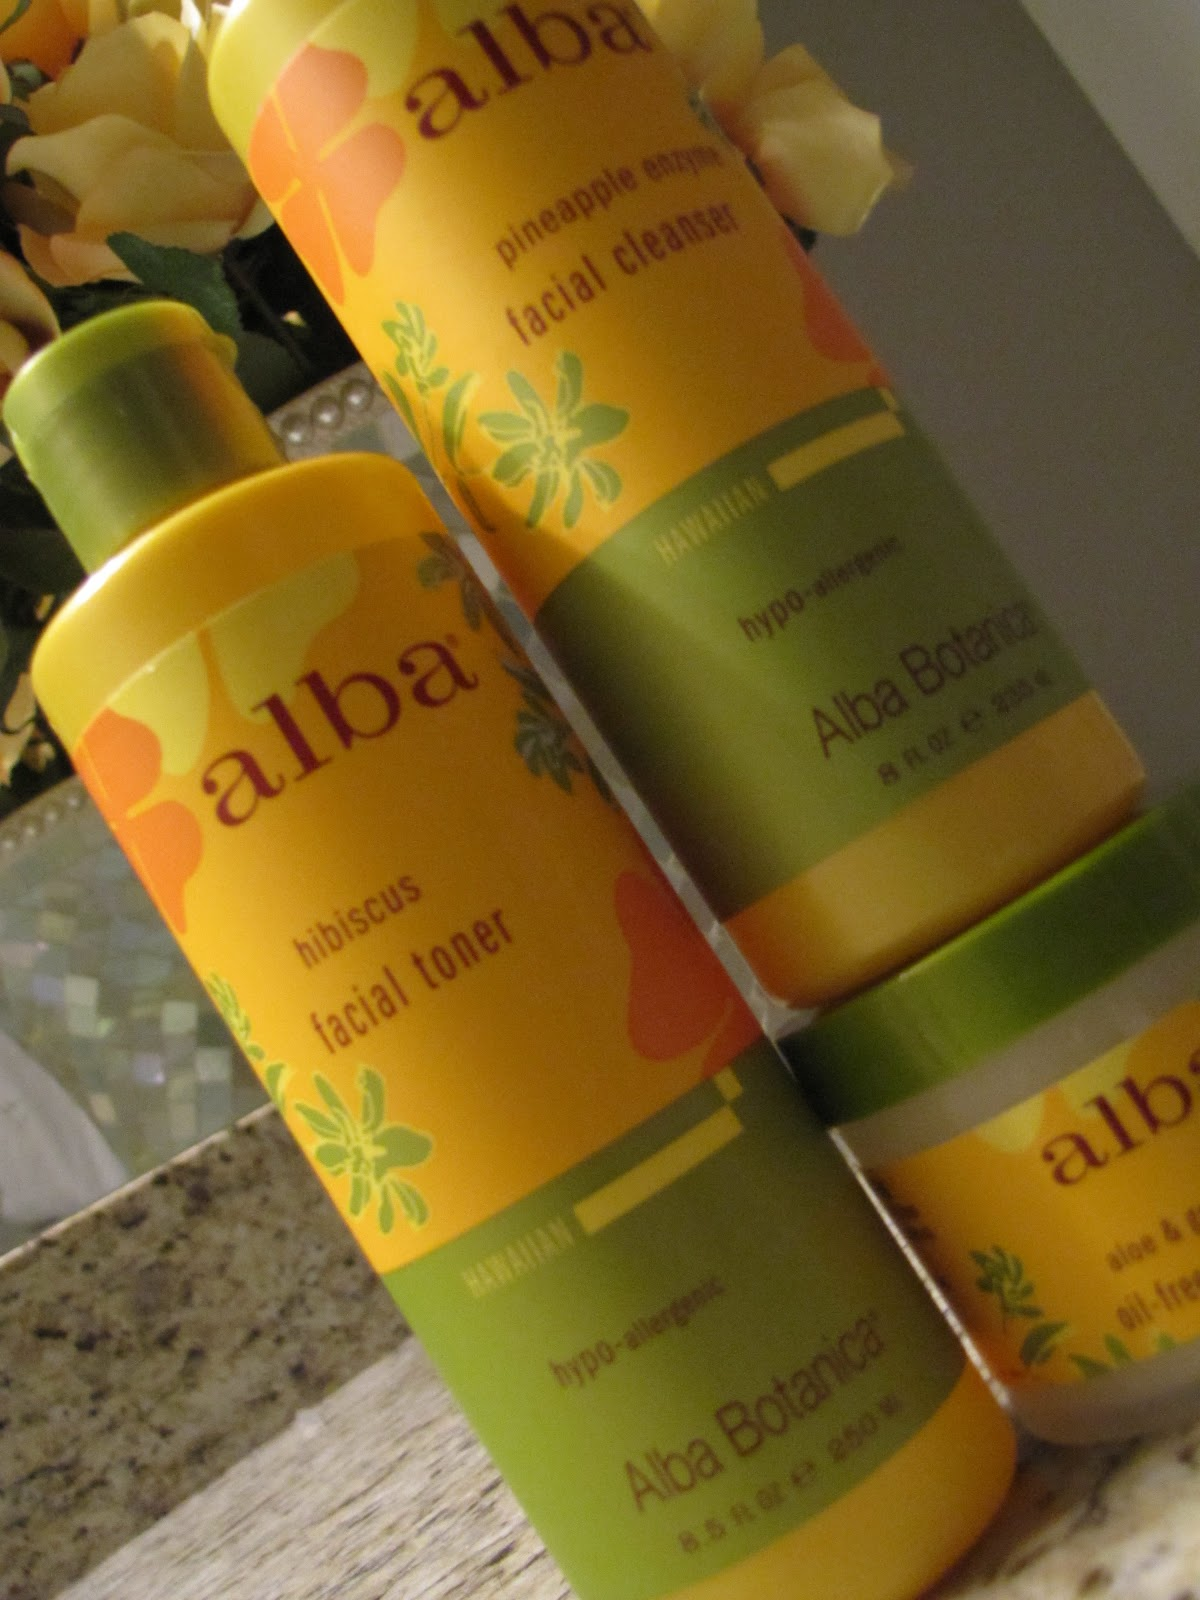 PRODUCT REVIEW: Alba Botanica